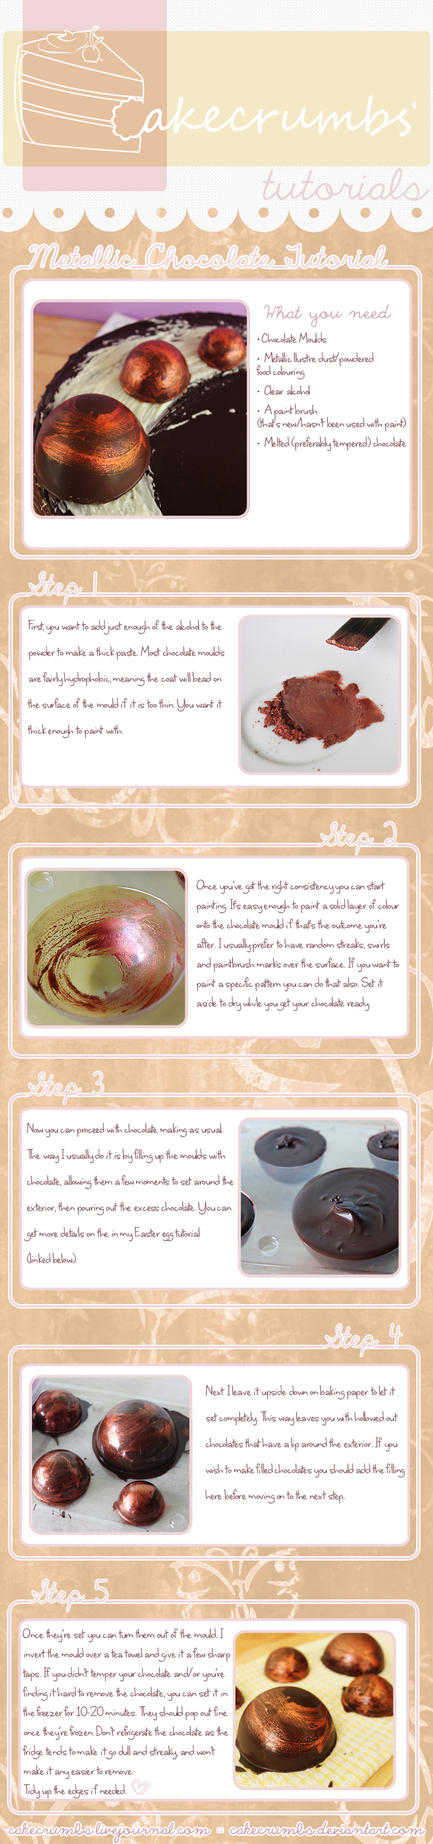 Metallic Chocolate Tutorial by cakecrumbs